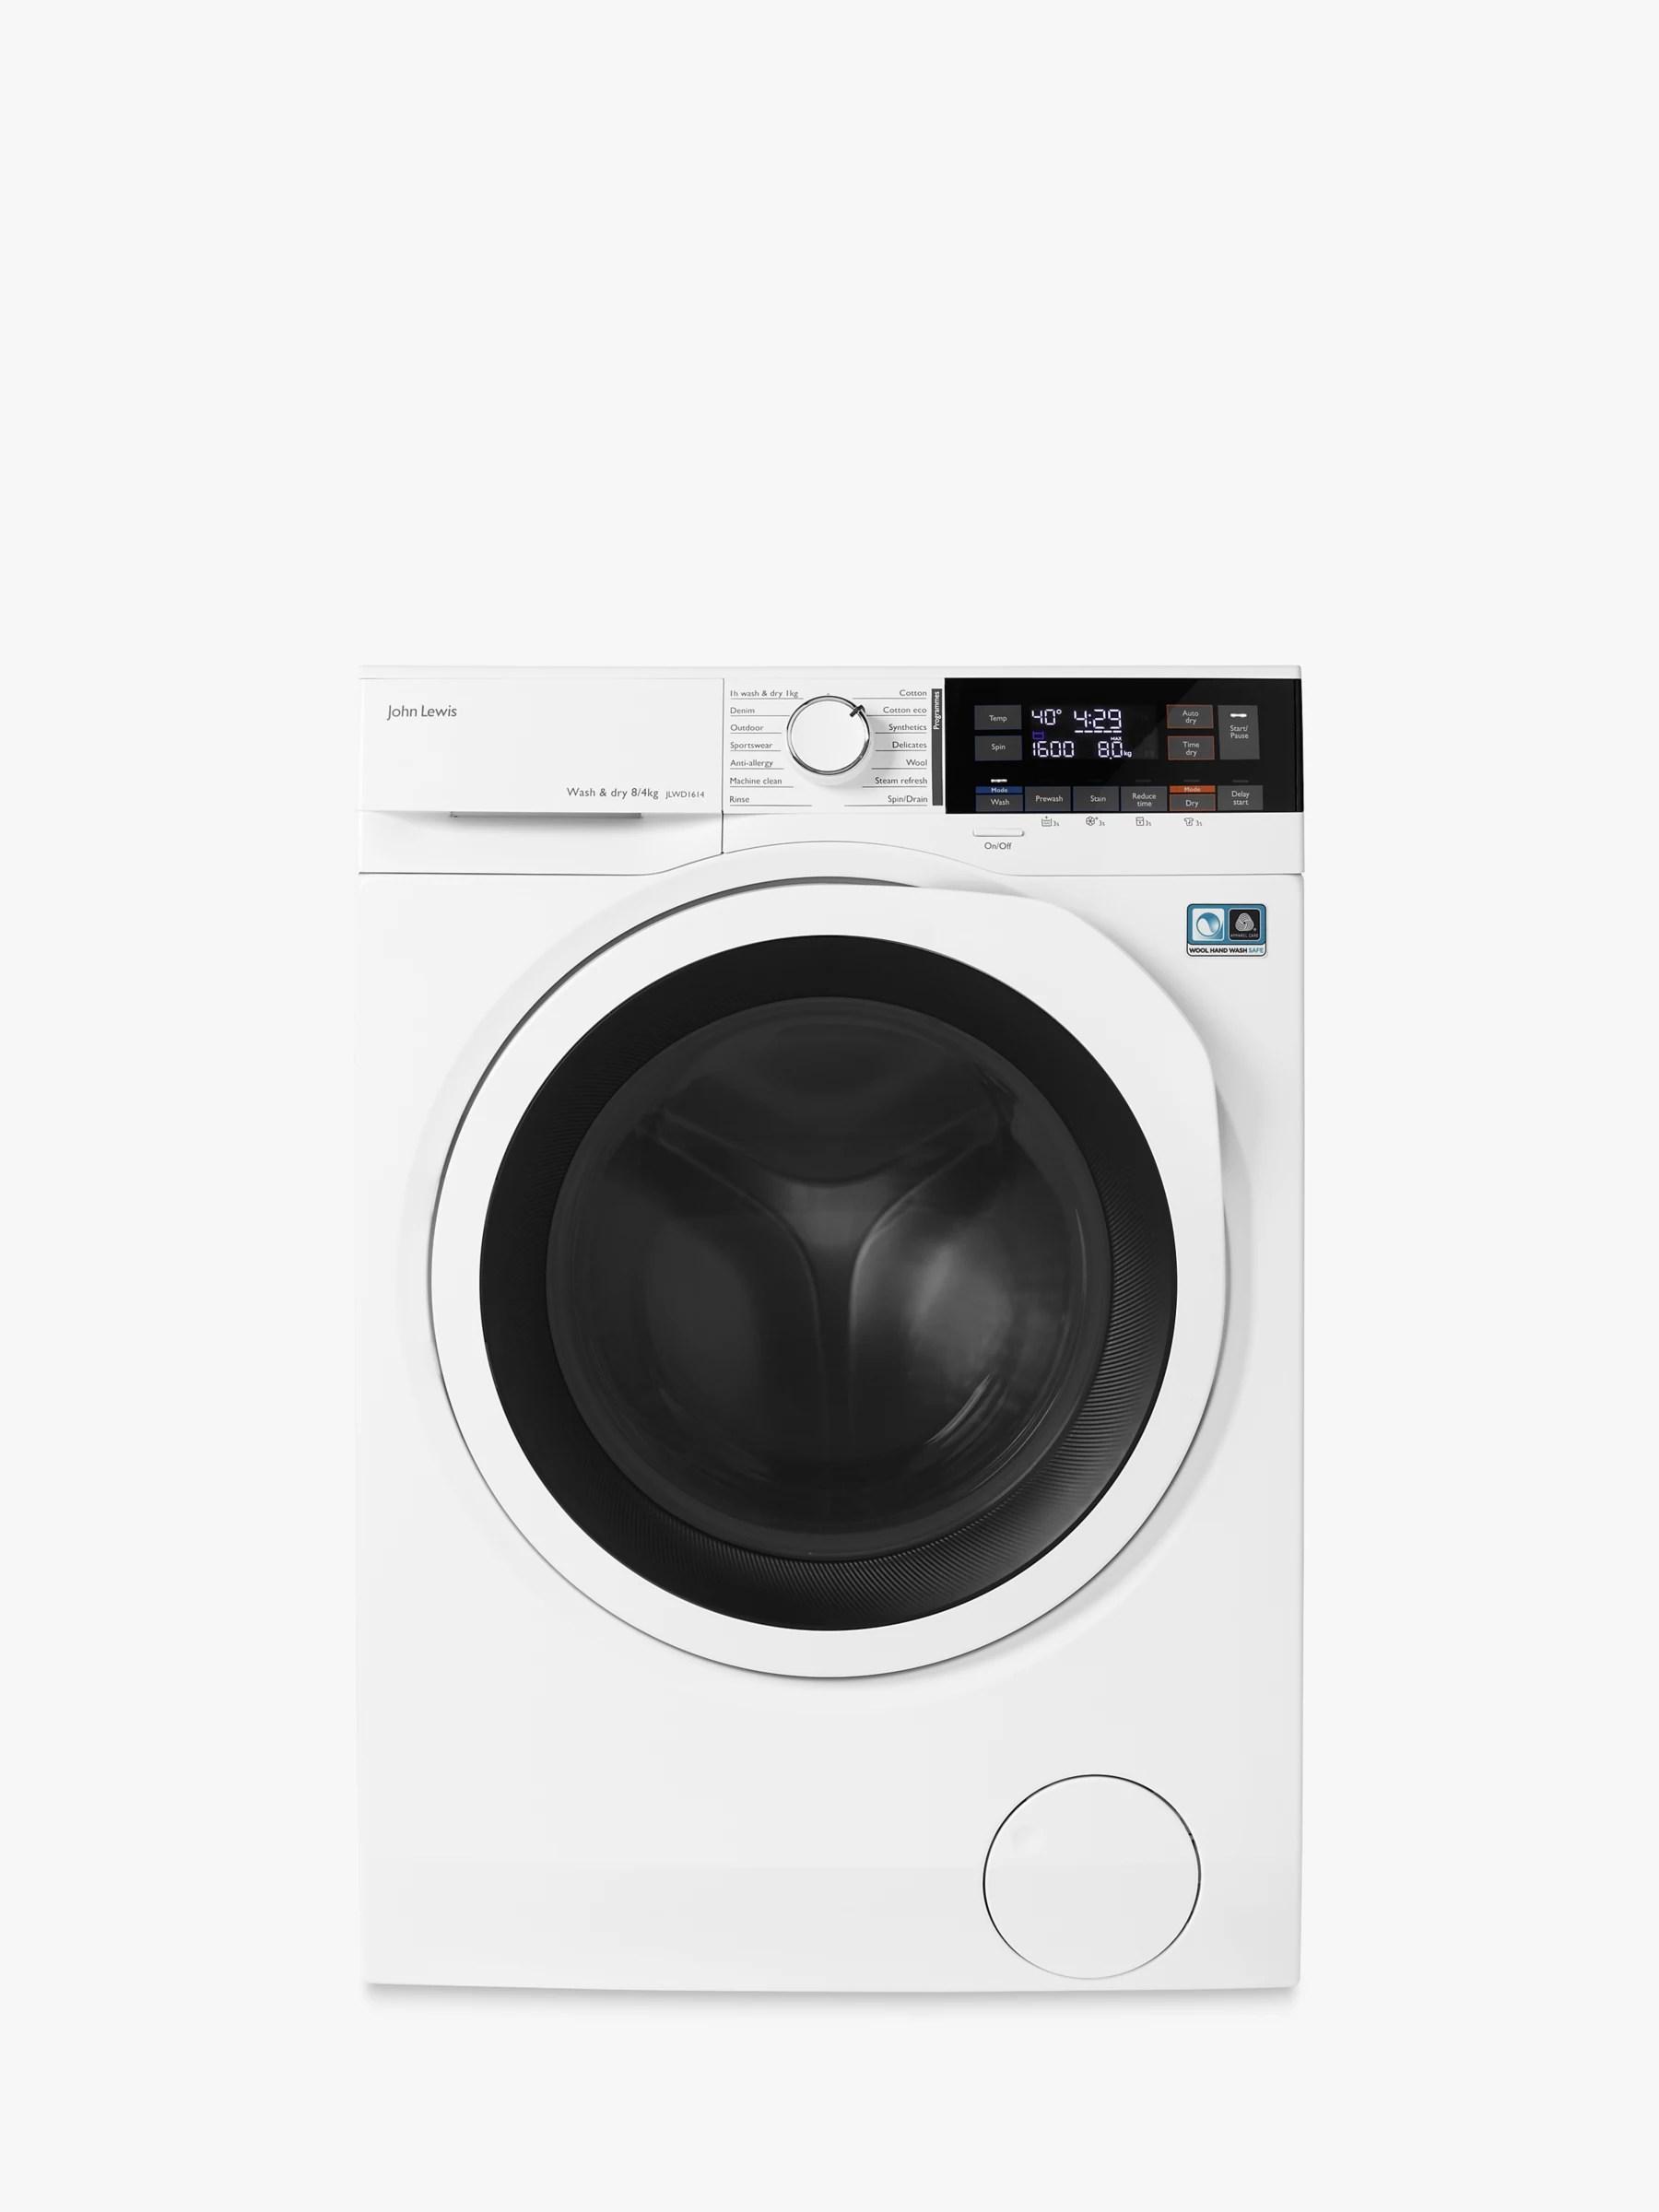 medium resolution of buy john lewis partners jlwd1614 freestanding washer dryer 8kg wash 4kg dry load